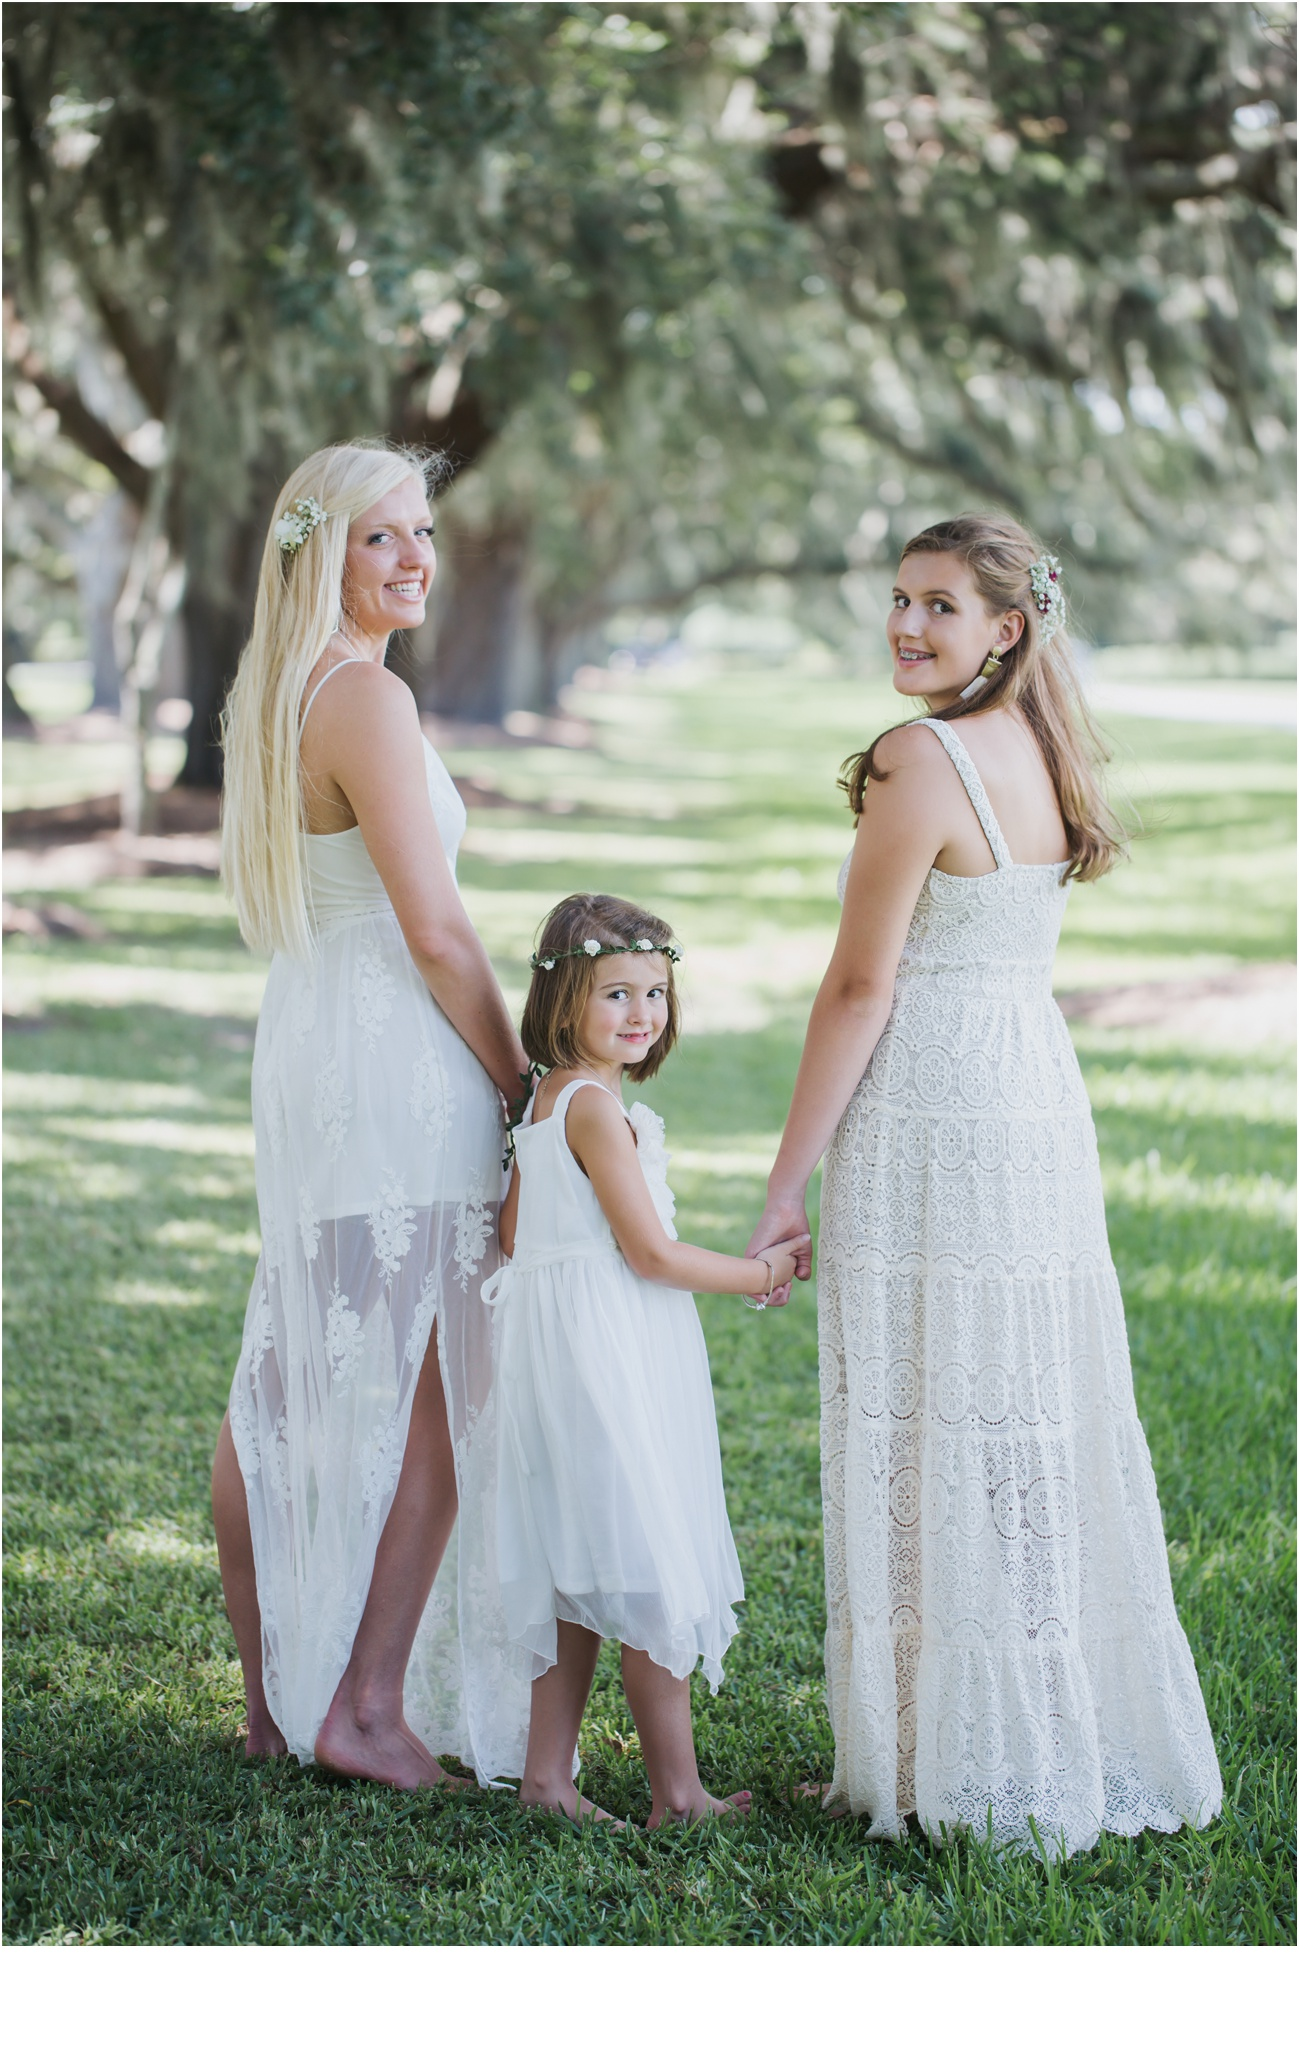 Rainey_Gregg_Photography_St._Simons_Island_Georgia_California_Wedding_Portrait_Photography_1107.jpg